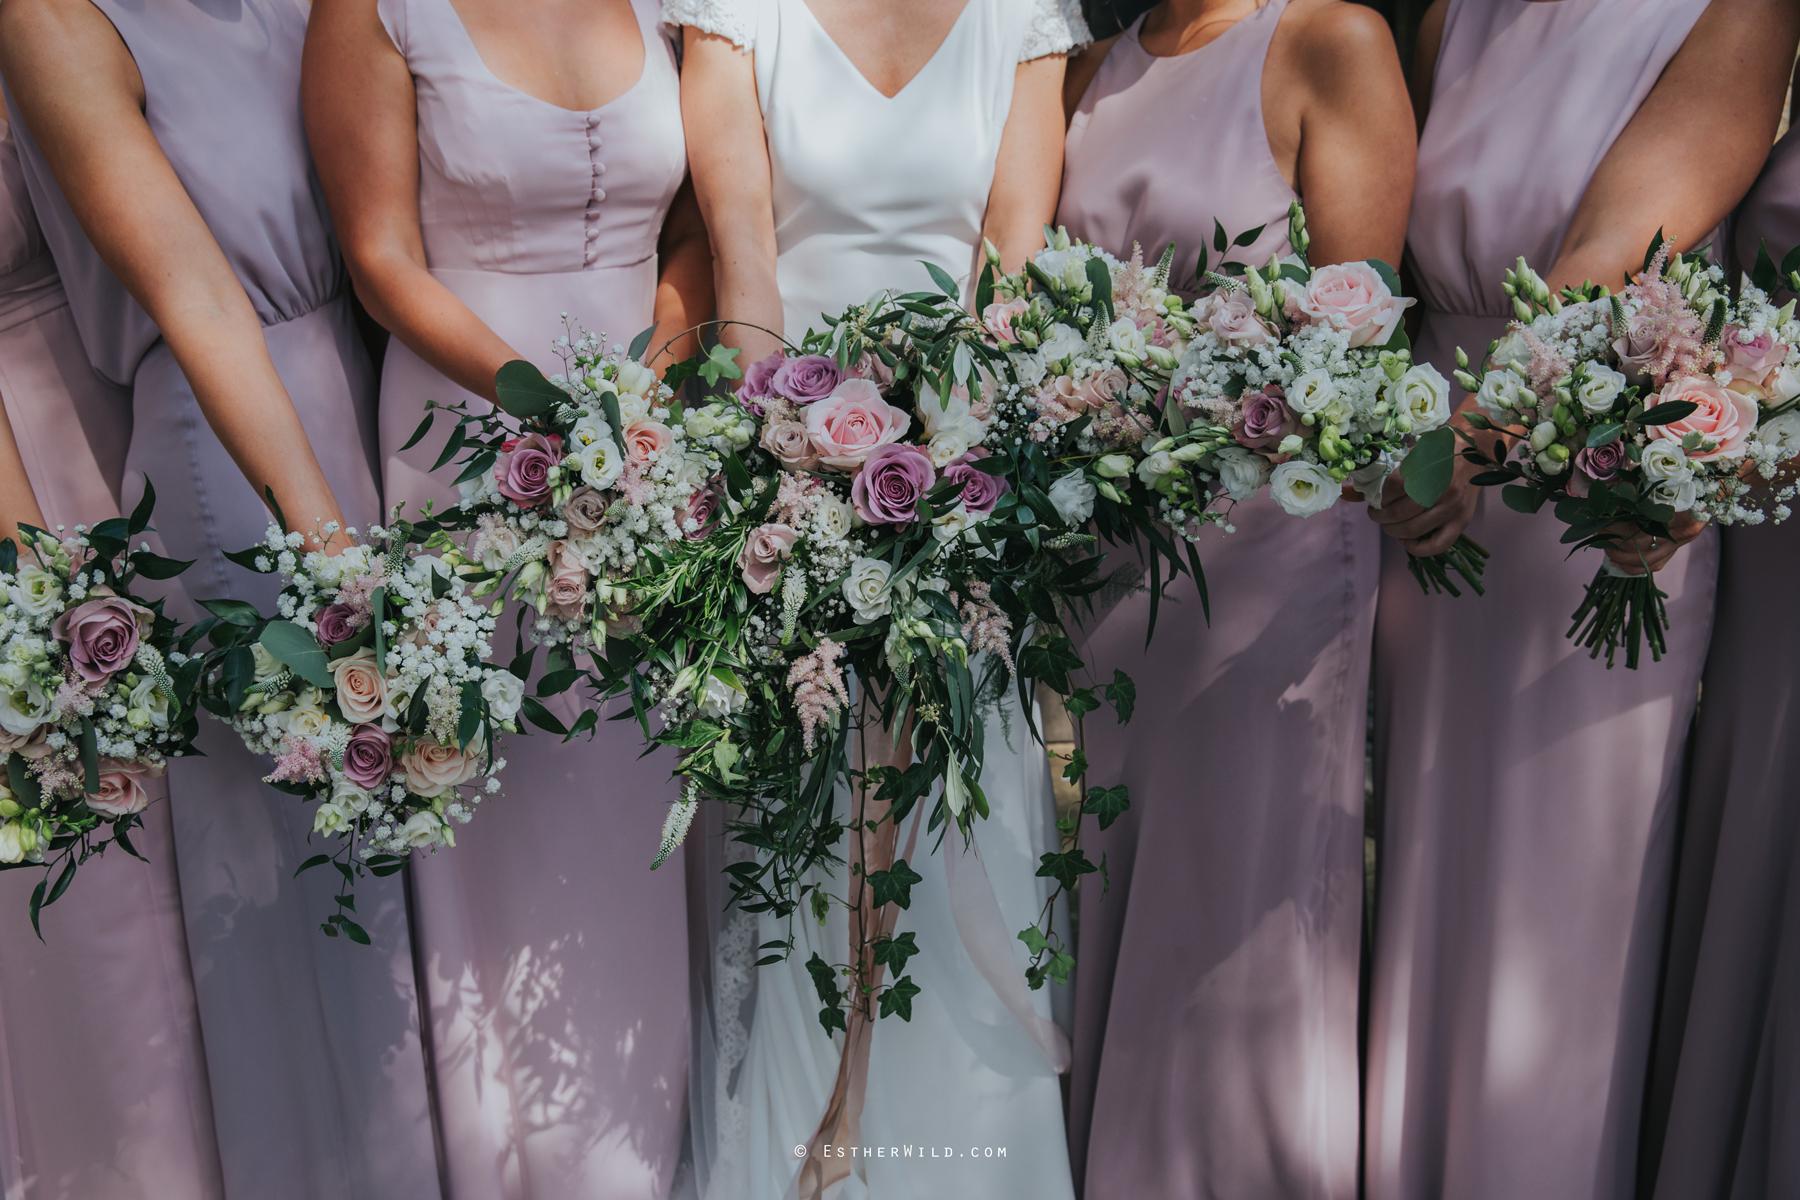 Wootton_Wedding_Copyright_Esther_Wild_Photographer_IMG_1322.jpg